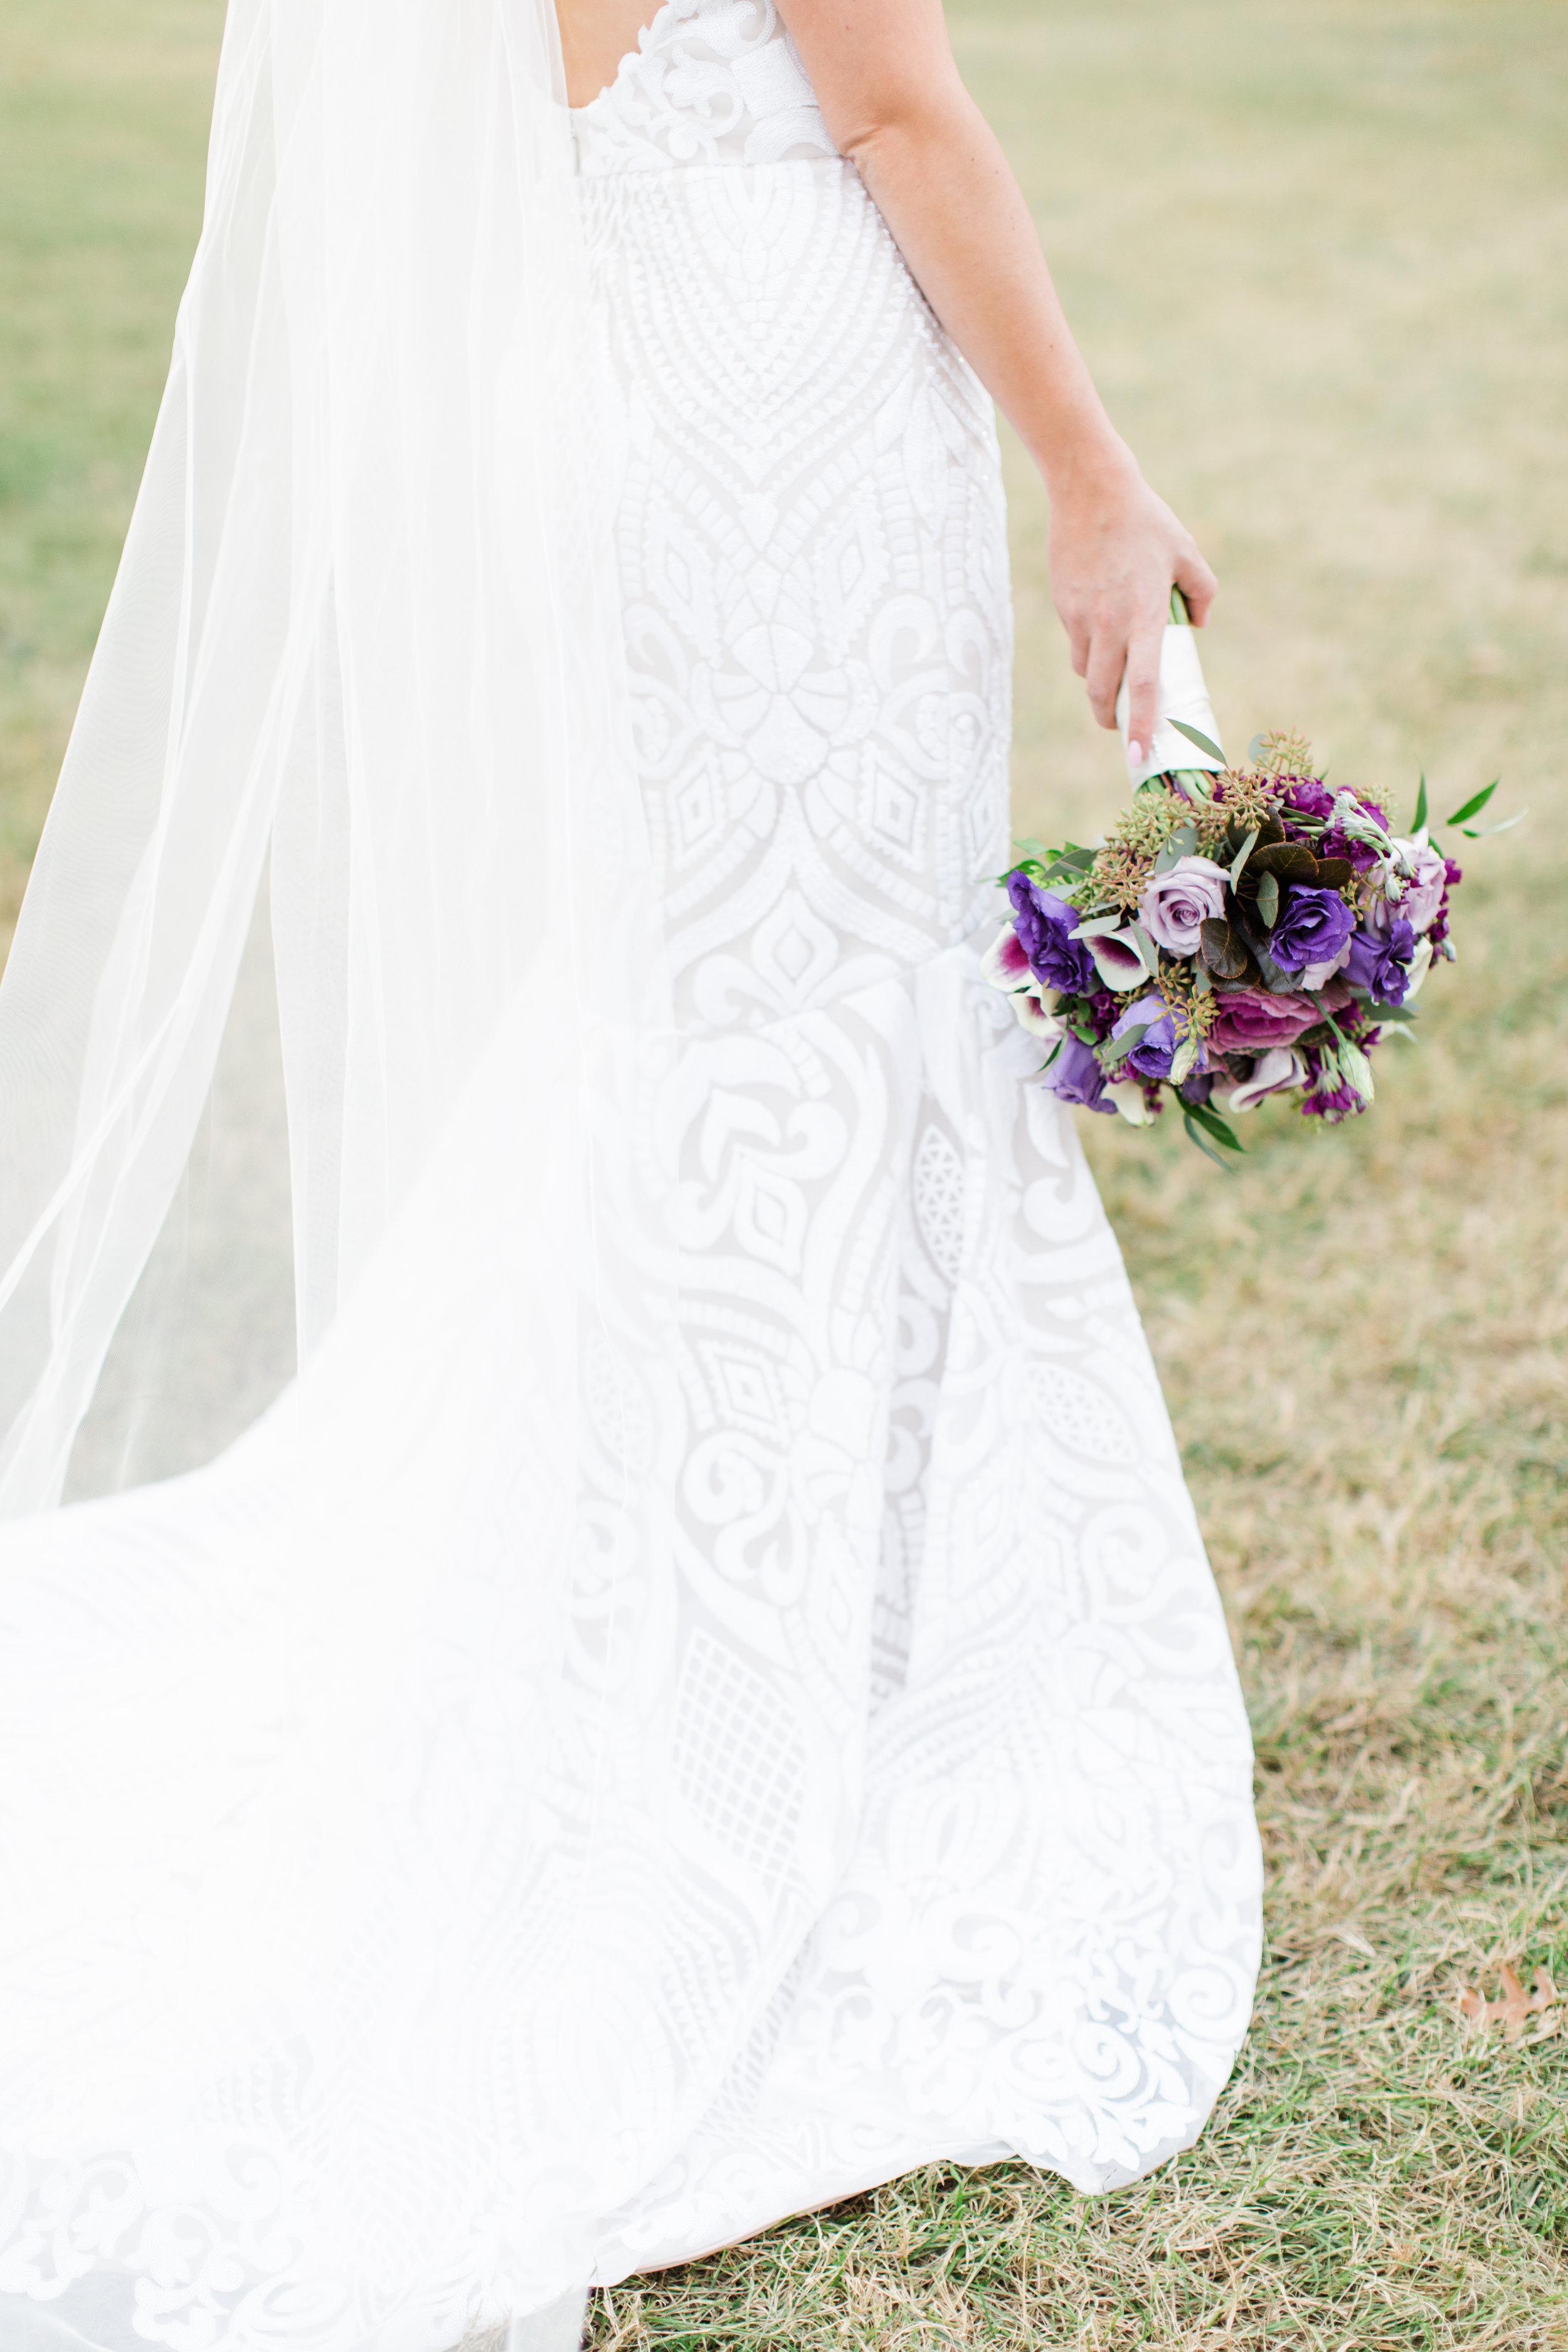 DavidAmandaMundy-Wedding-10282017-KathrynIvyPhotography-362.jpg